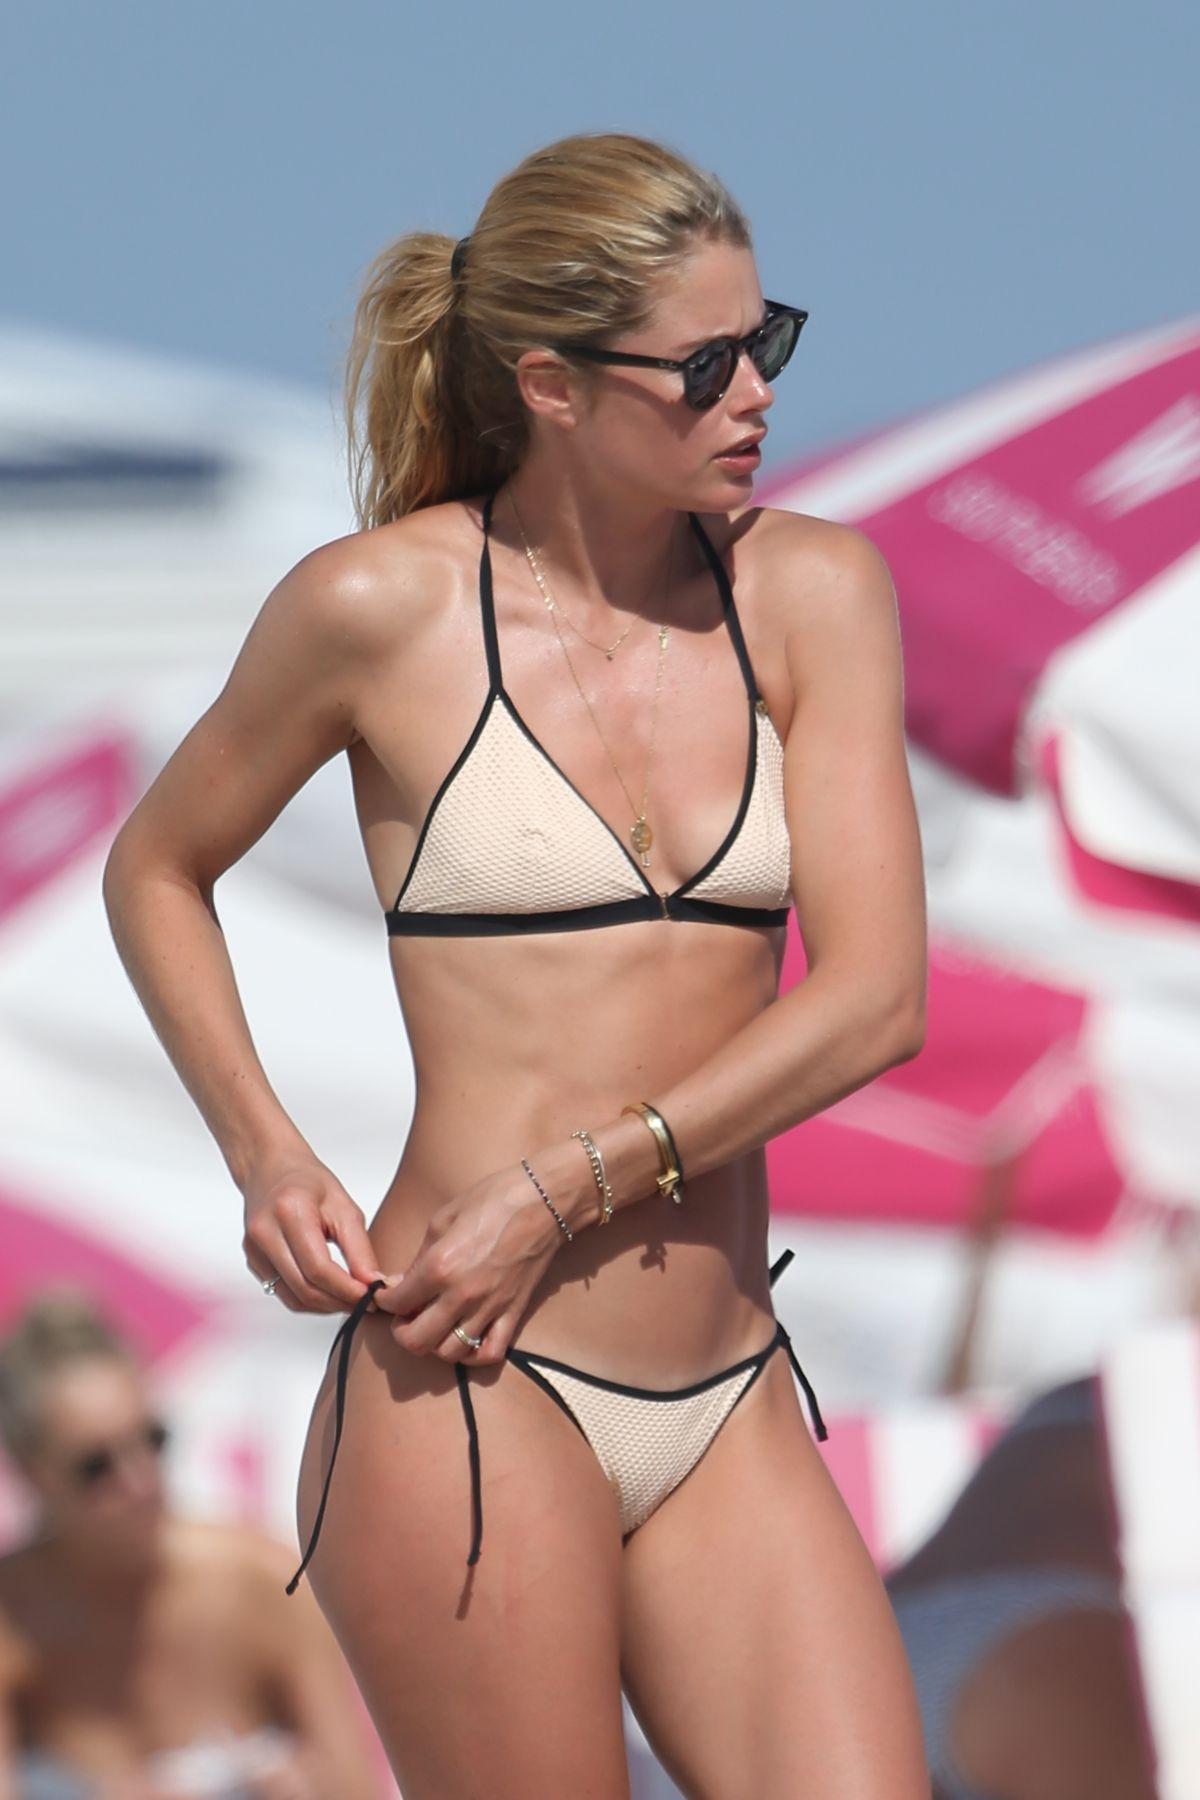 DOUTZEN KROES in Bikini on the Beach in Miami 31/12/2016